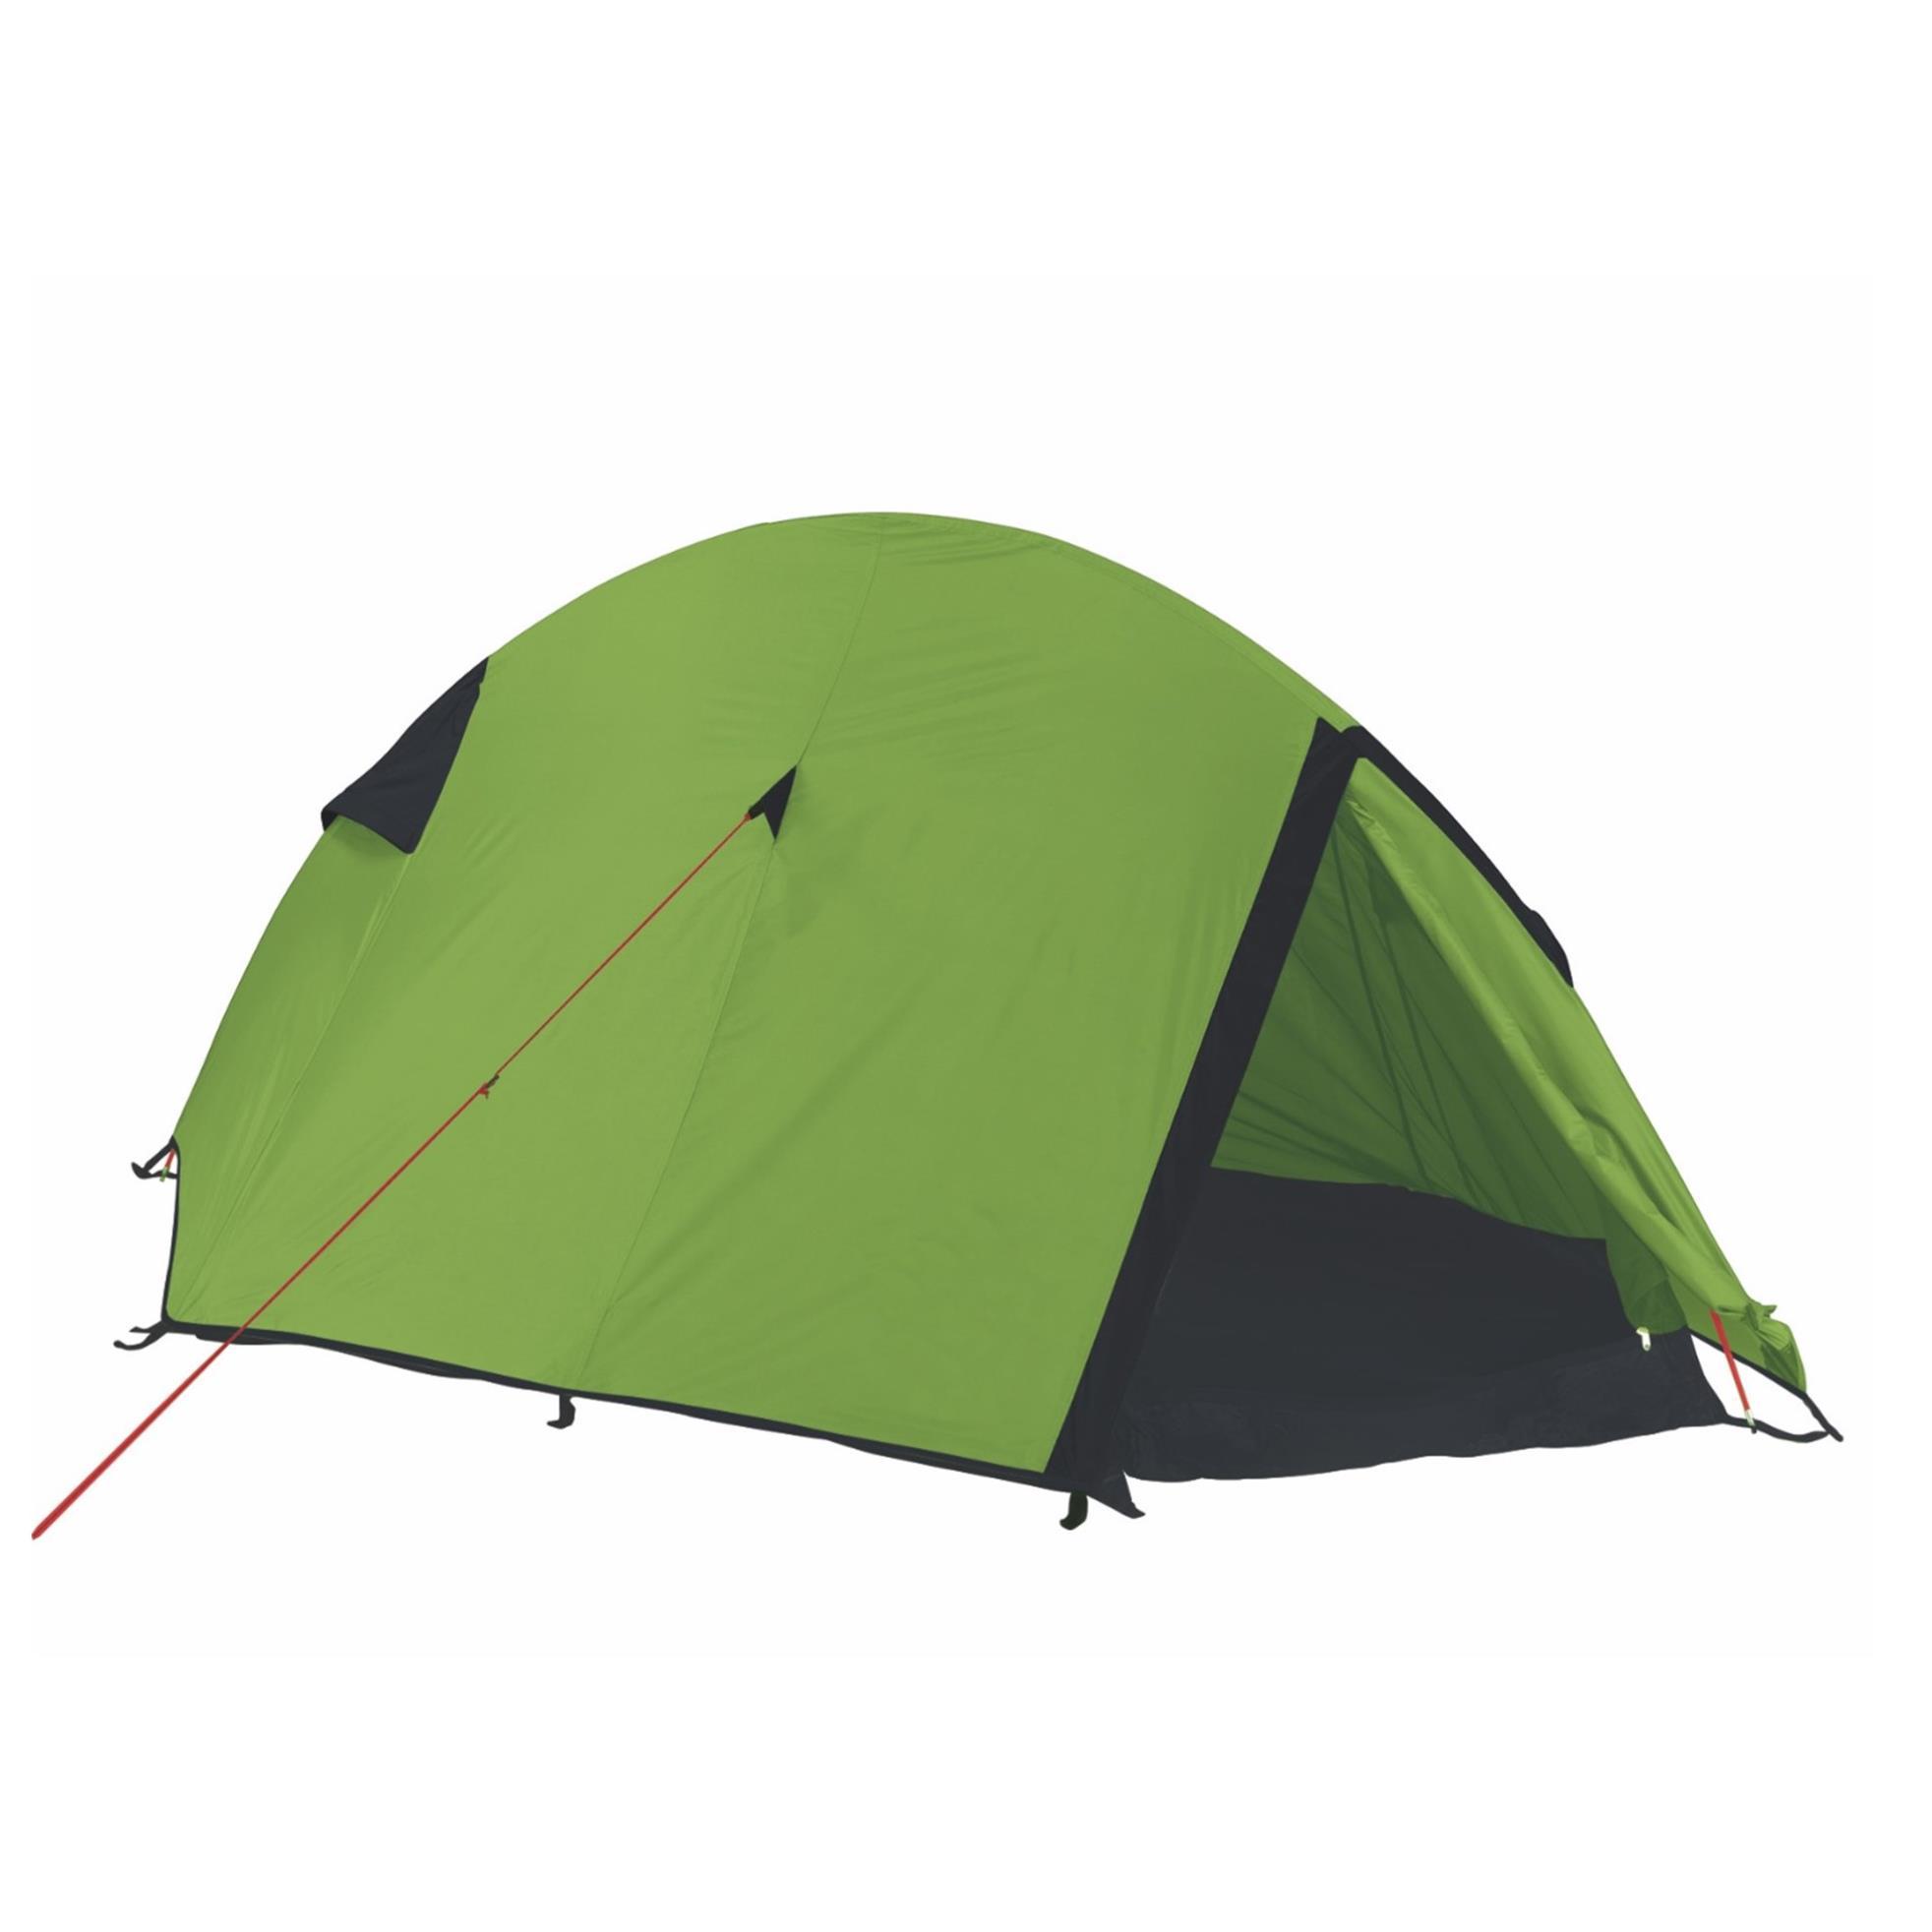 Image of Grand Canyon Cardova 1 Campingzelt grün